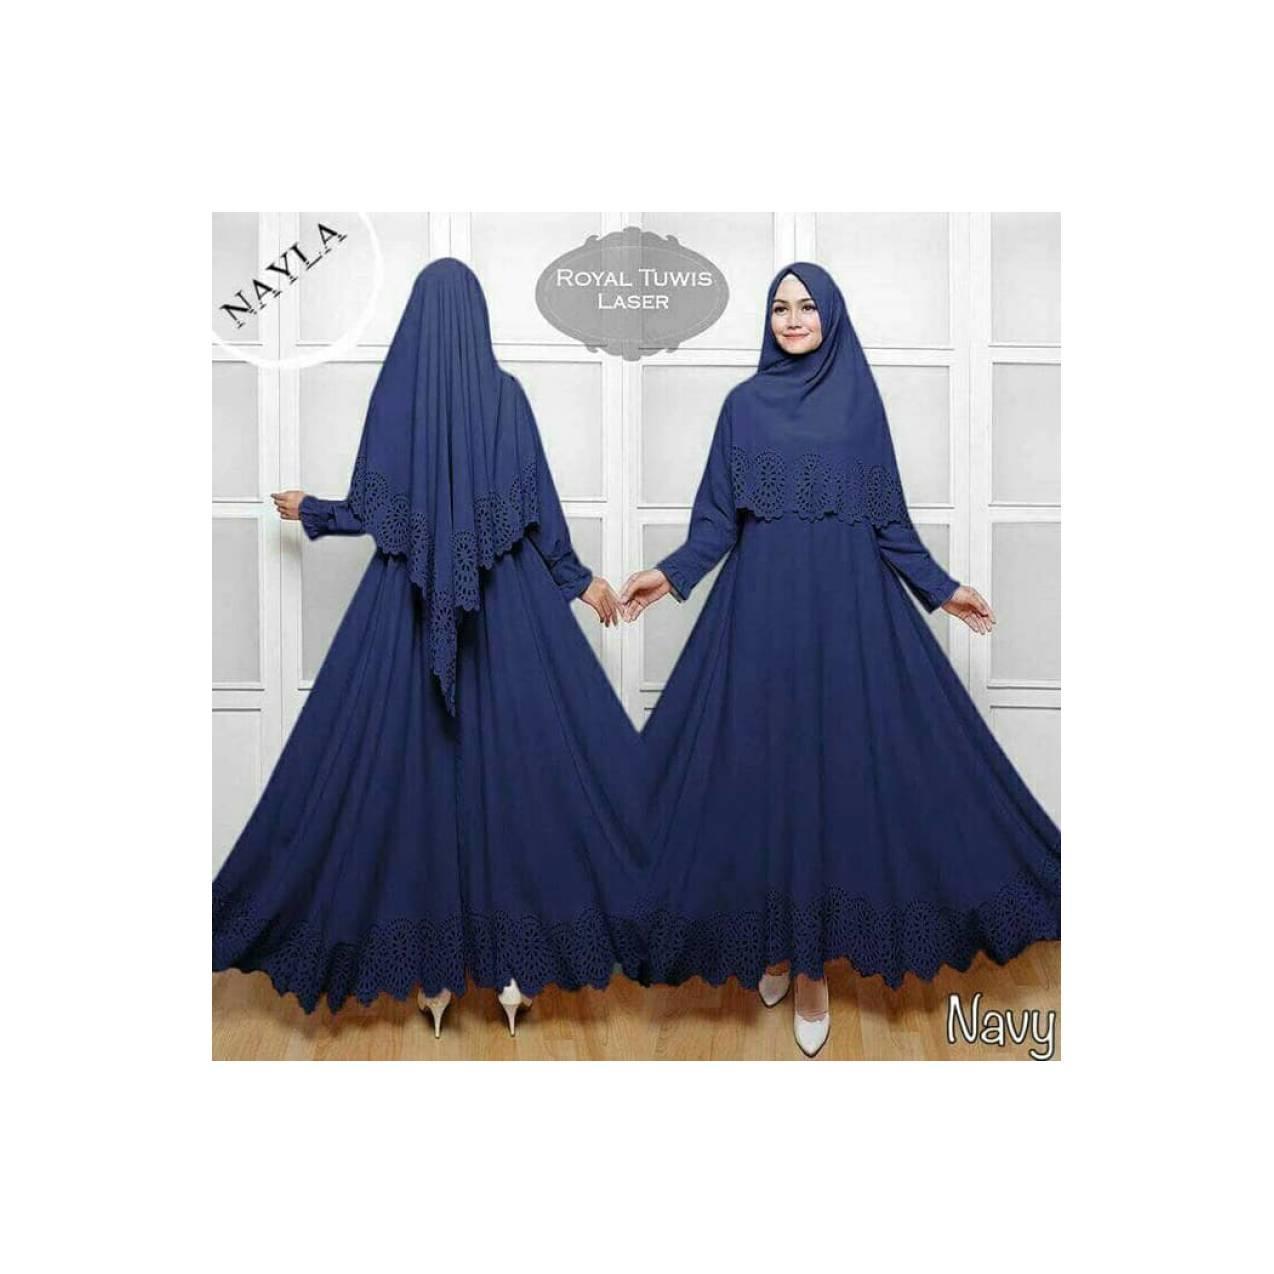 high quality Gamis / Baju Wanita Muslim Nayla Syari